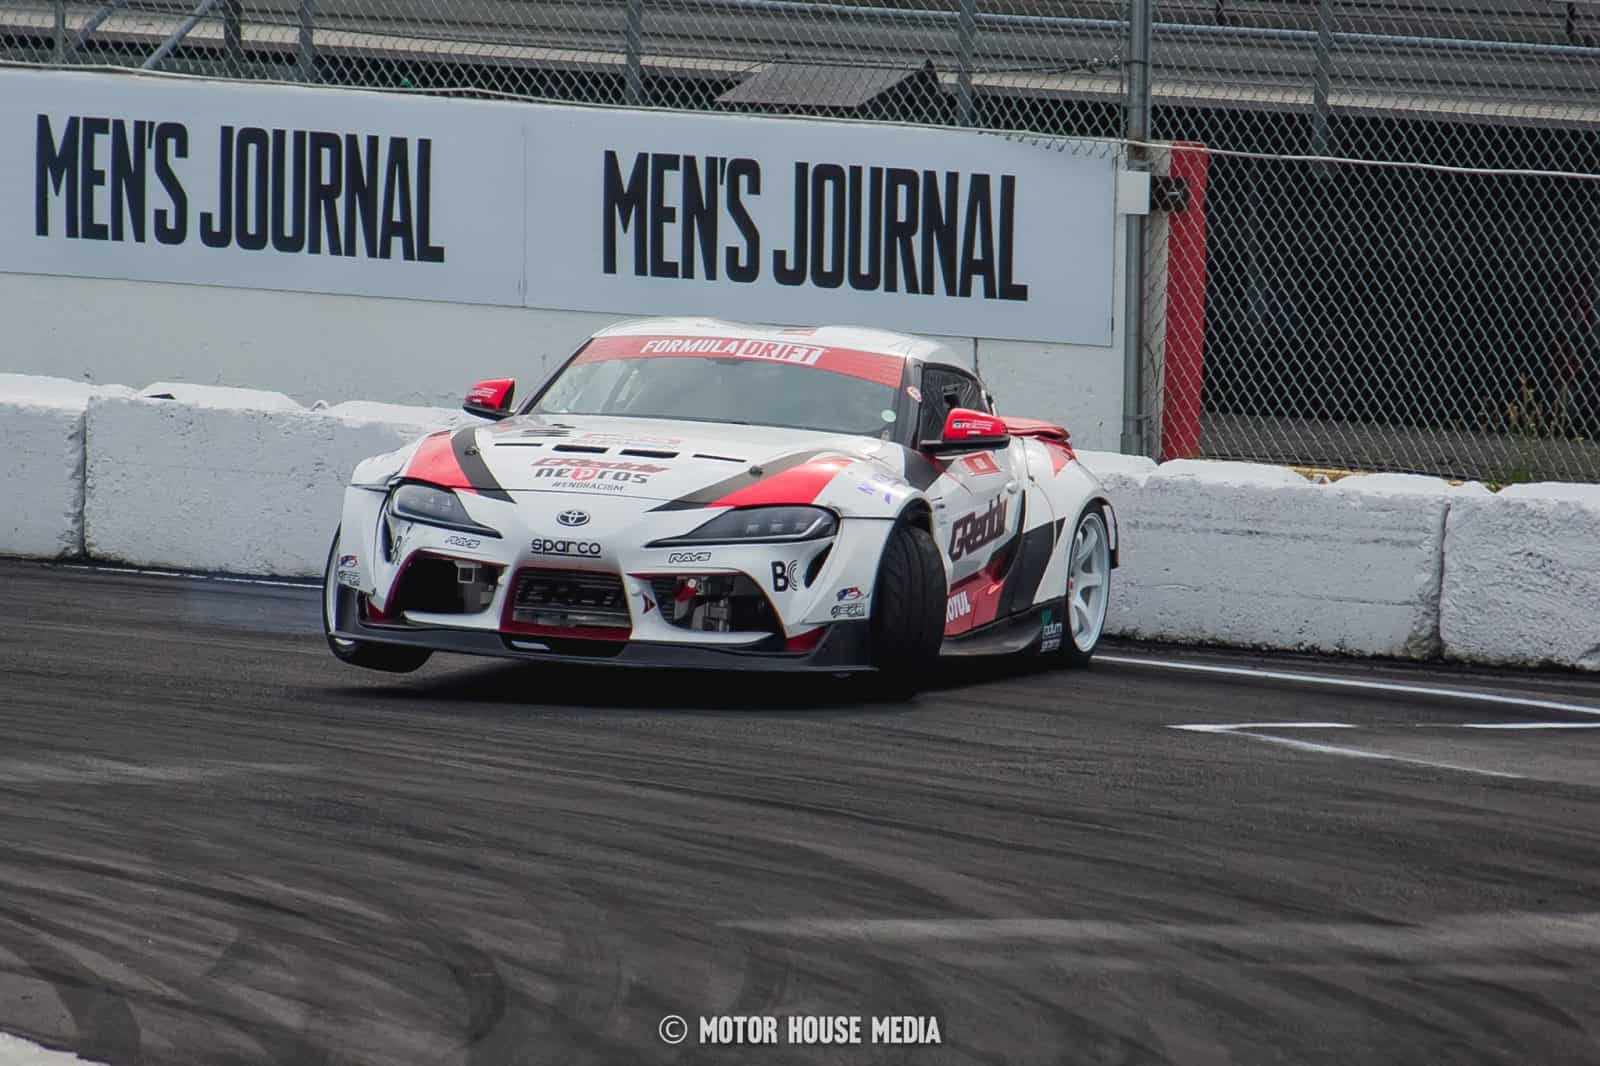 Ken Gushi in his Greddy Formula Drift car